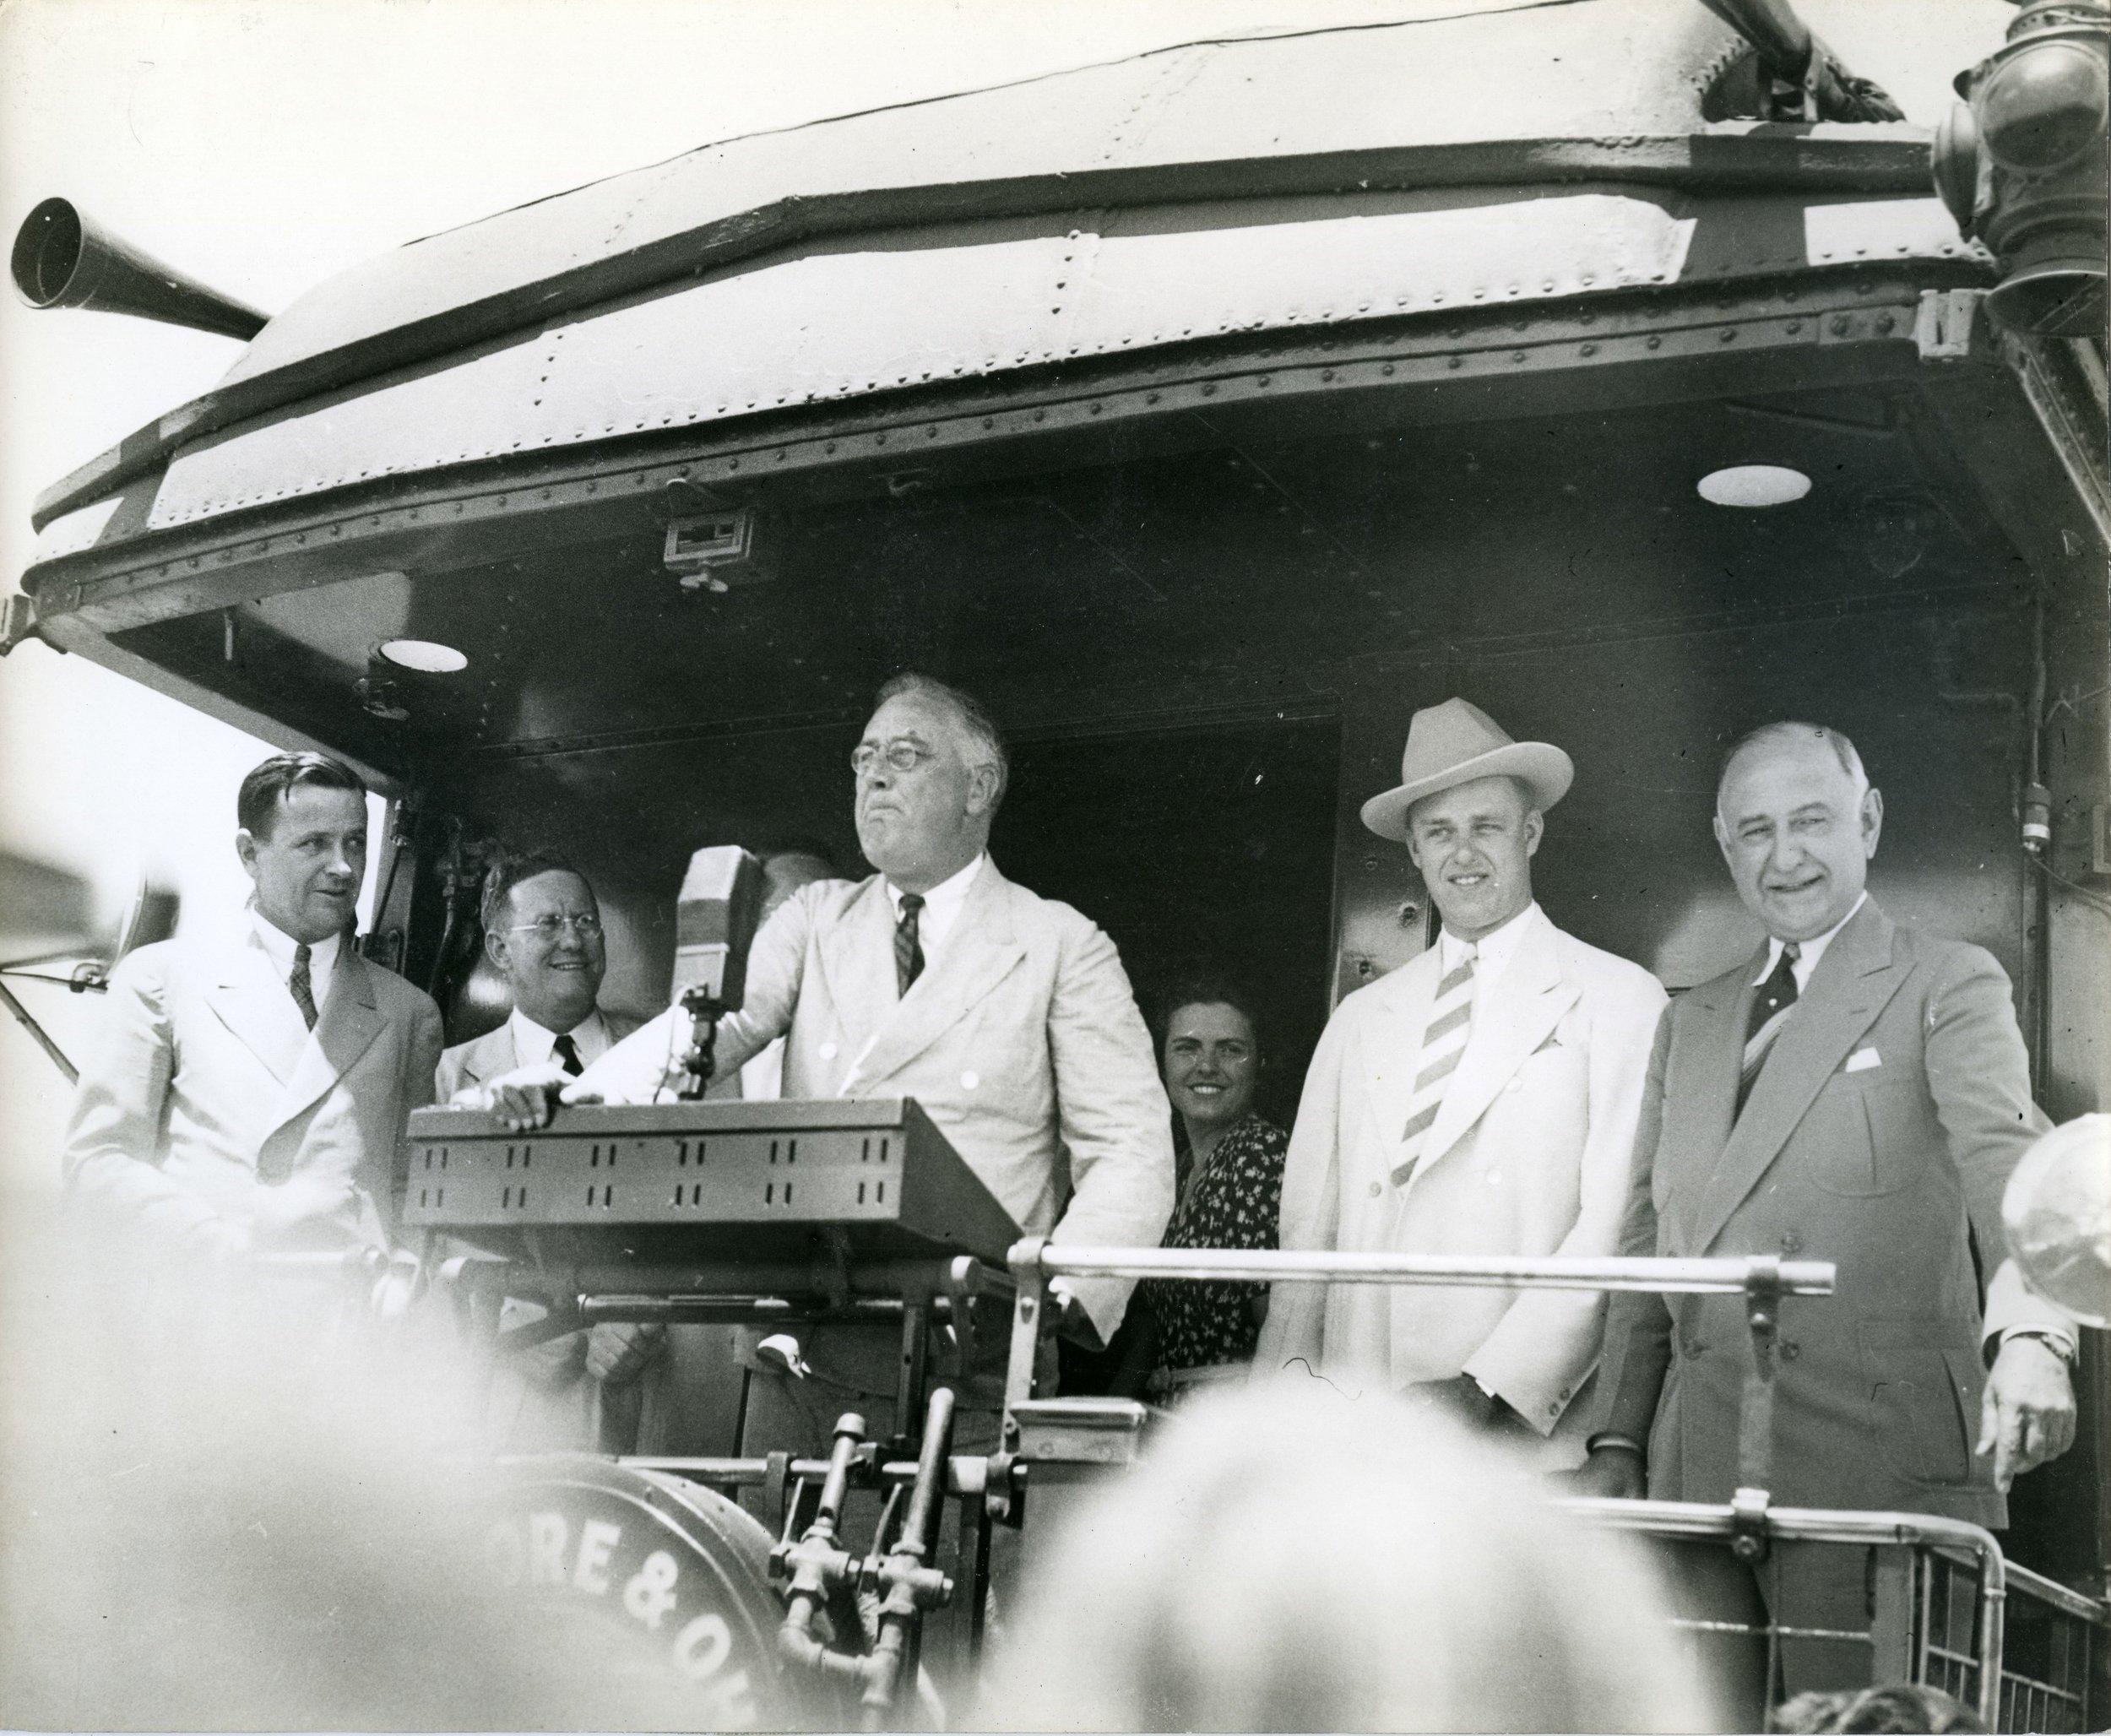 Roosevelt_Franklin_Presidential_Party_034.jpg